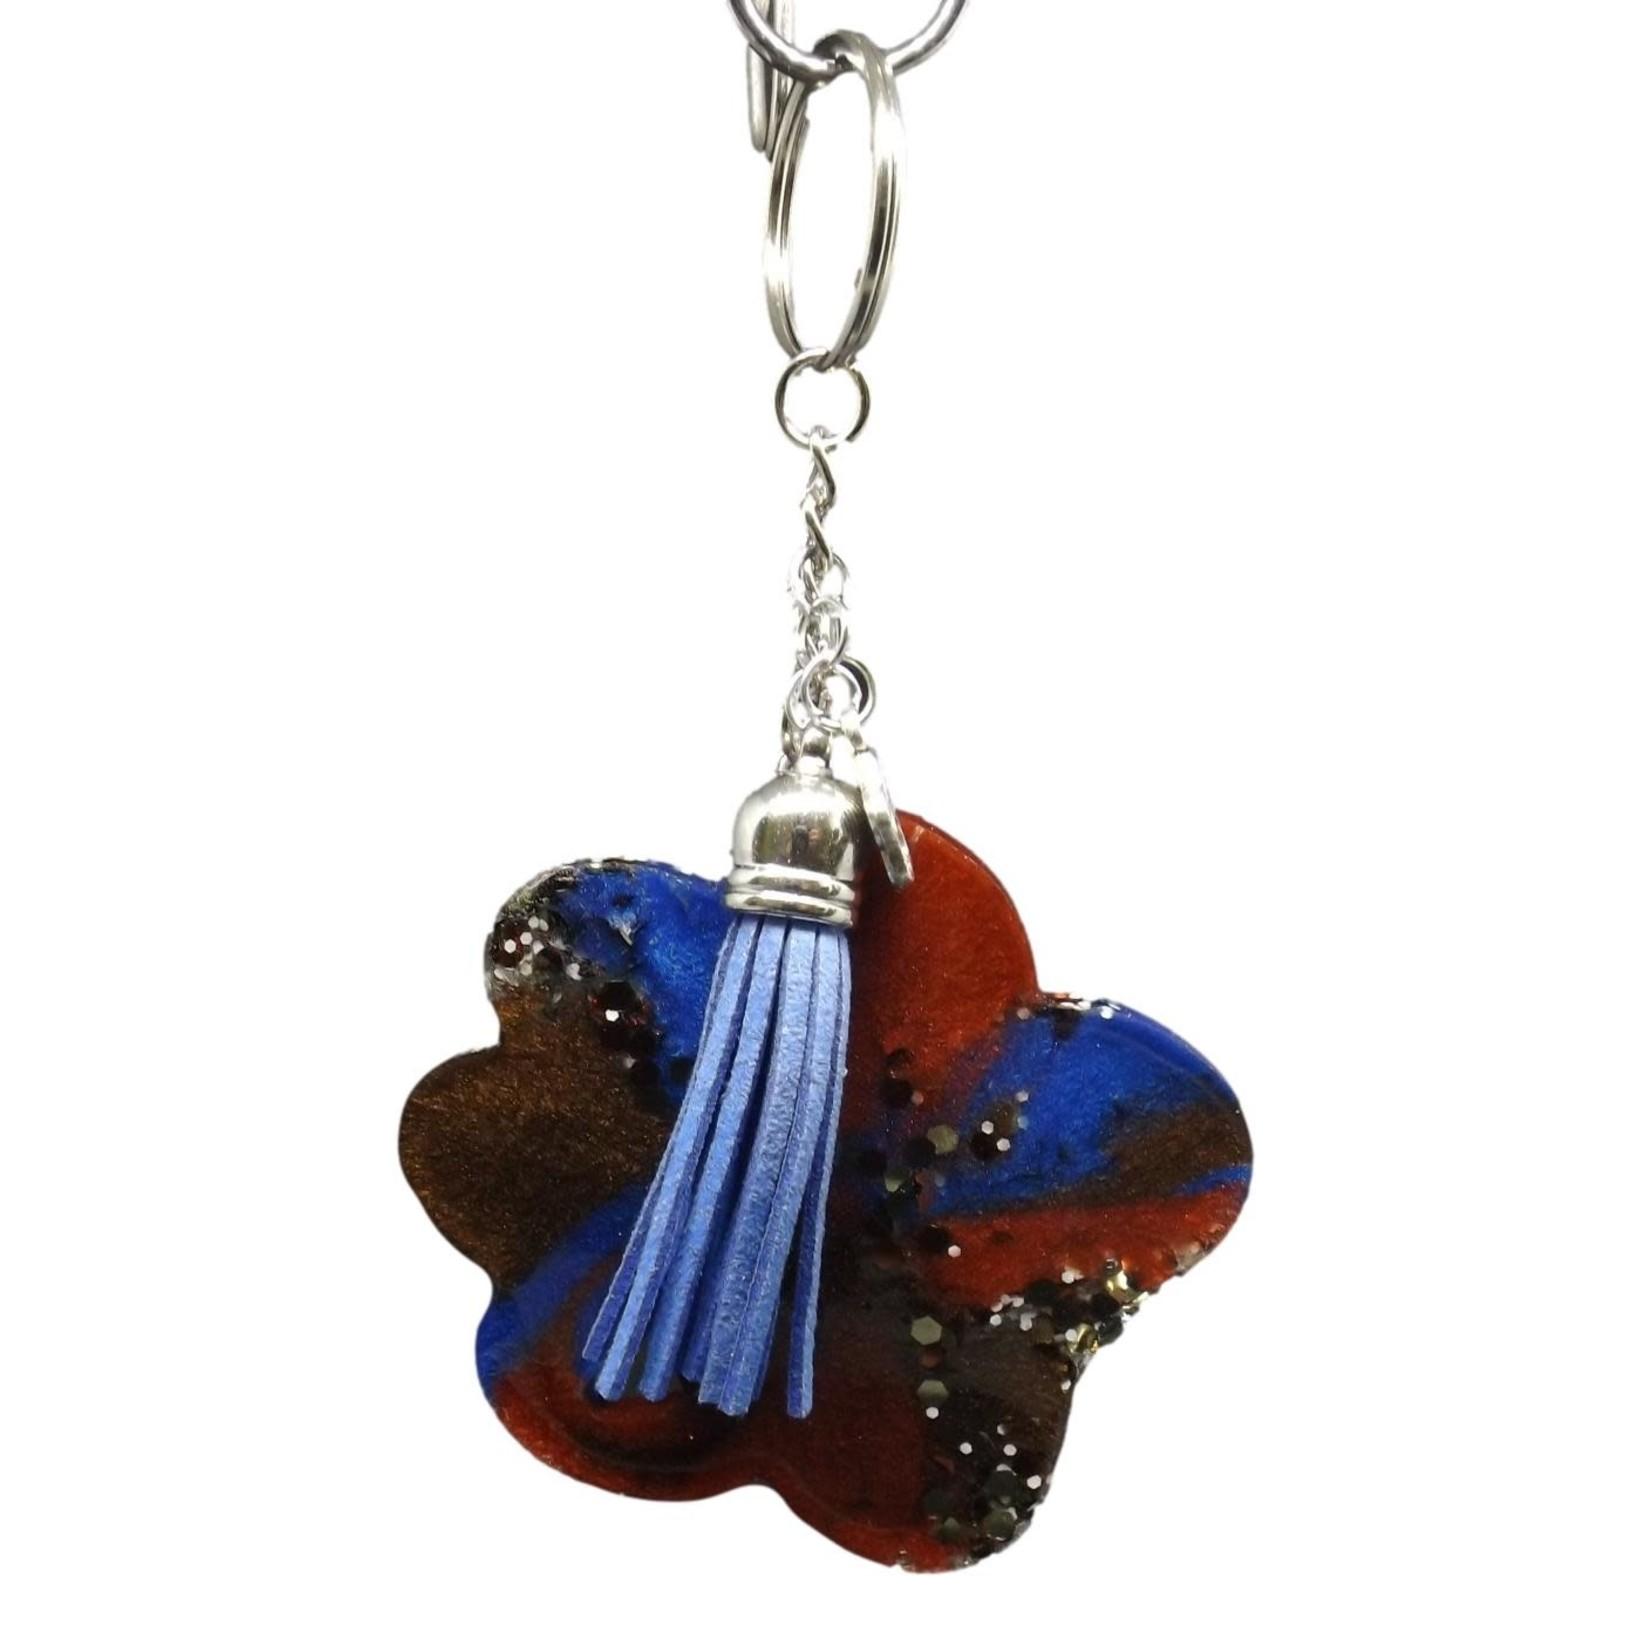 East Coast Sirens Multi-colour Paw Print Key Chain Charm